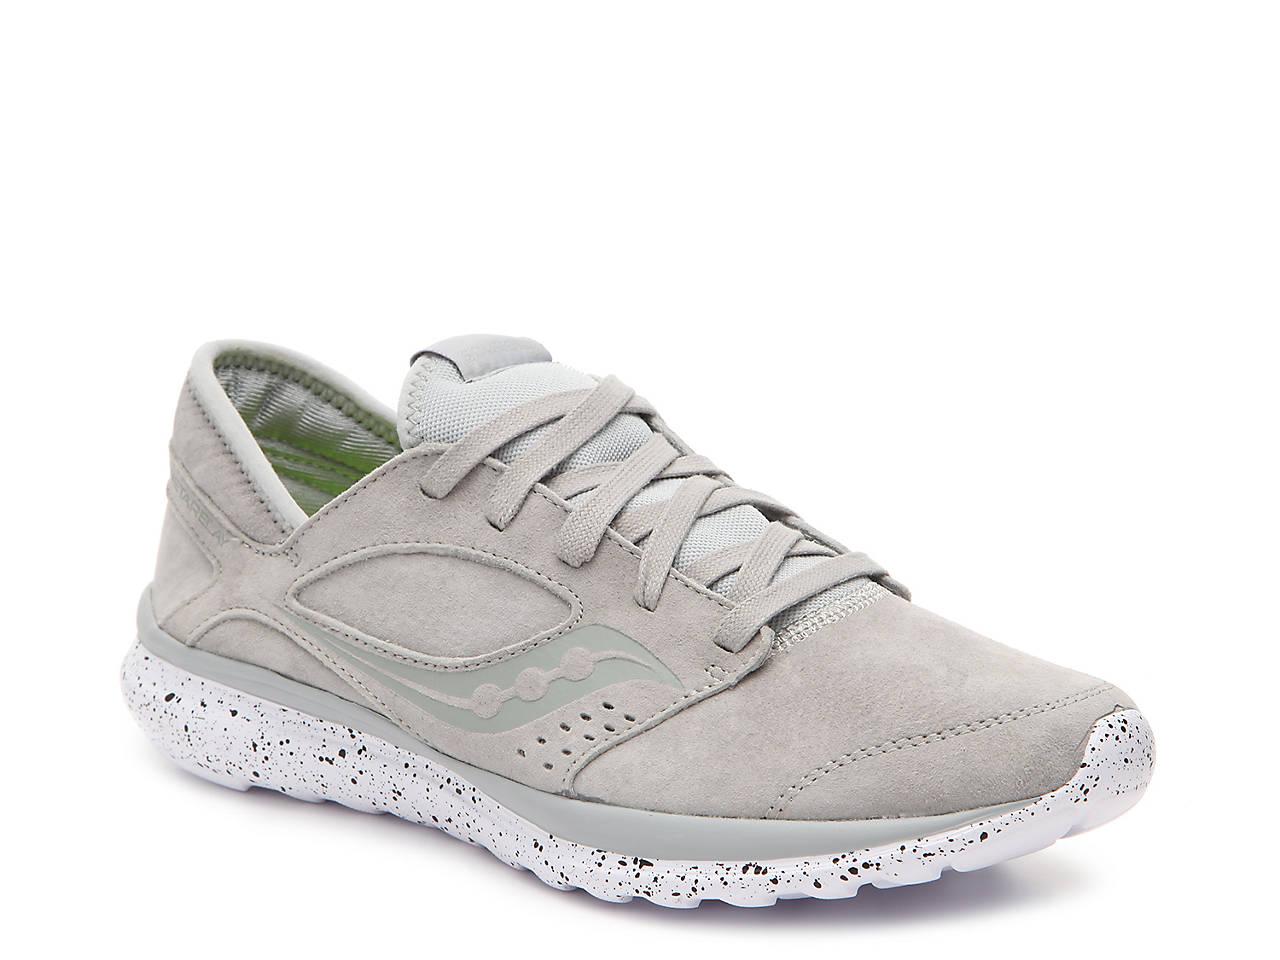 bfa9d69b5848 Saucony Kineta Relay Lightweight Running Shoe - Men s Men s Shoes